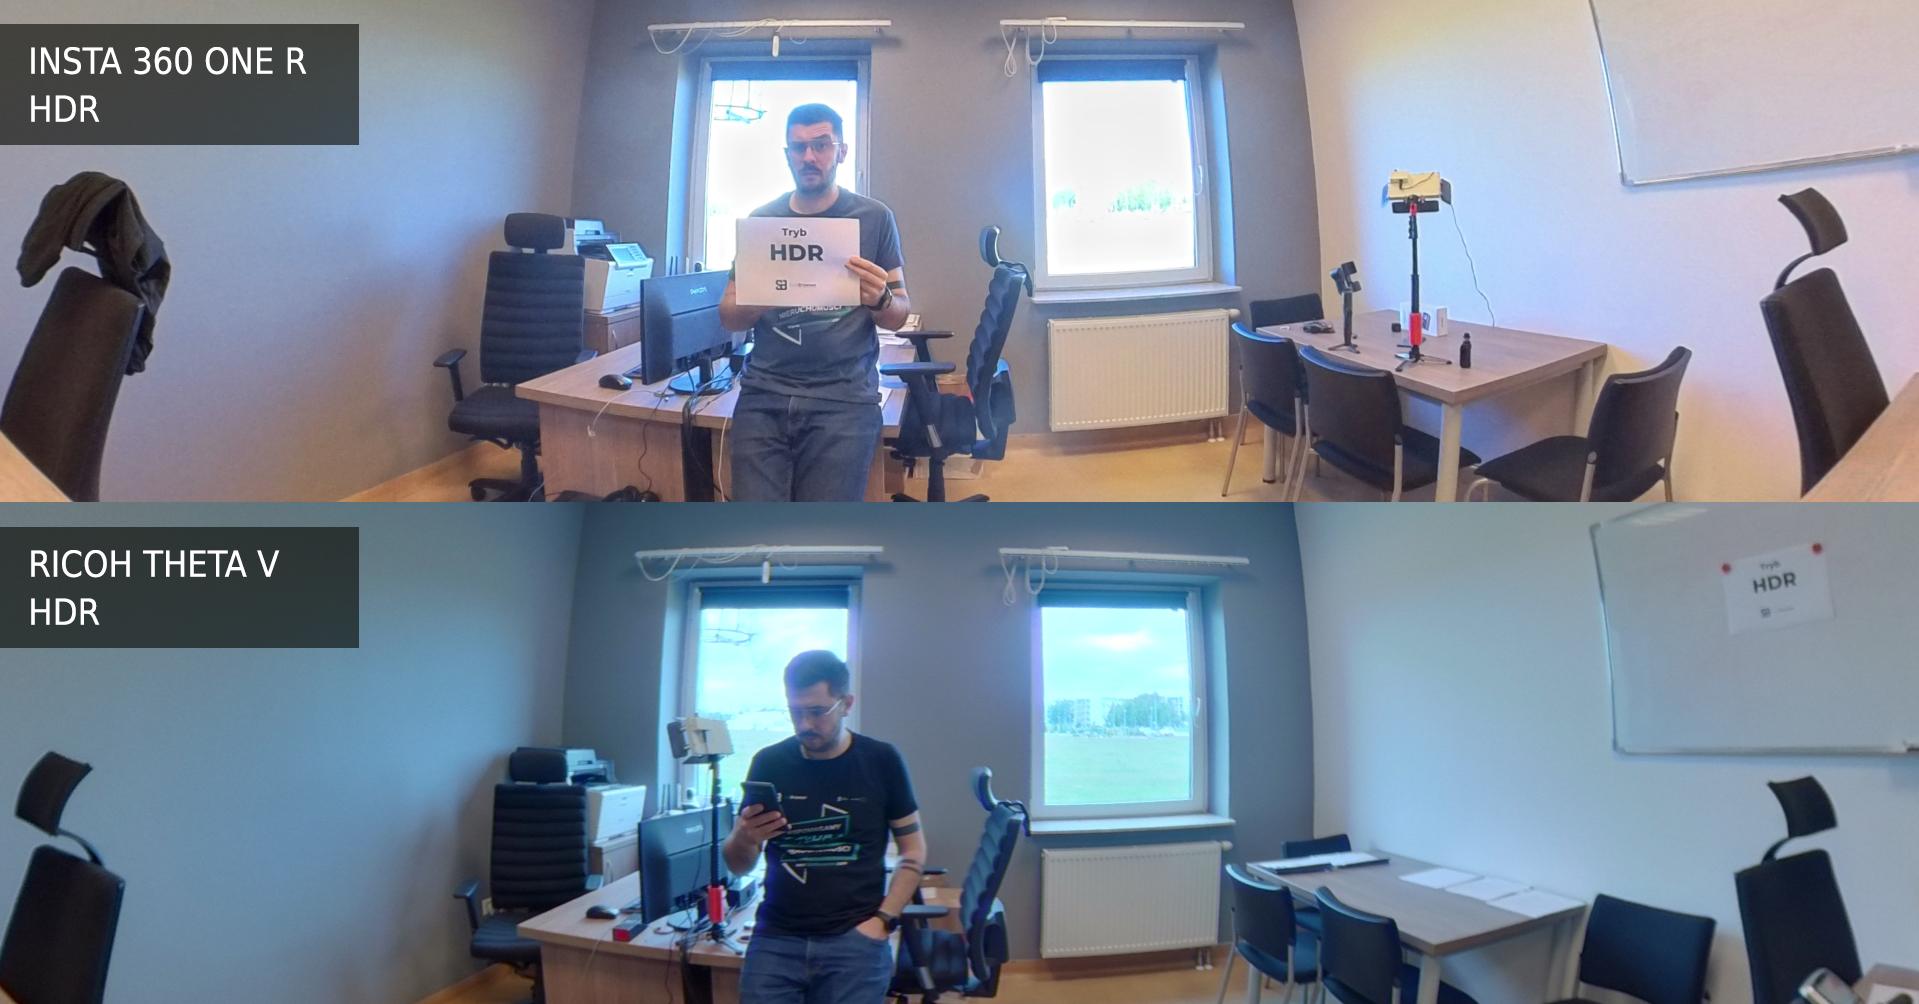 Ricoh Theta V vs Insta 360 One R tryb HDR, szeroki kąt